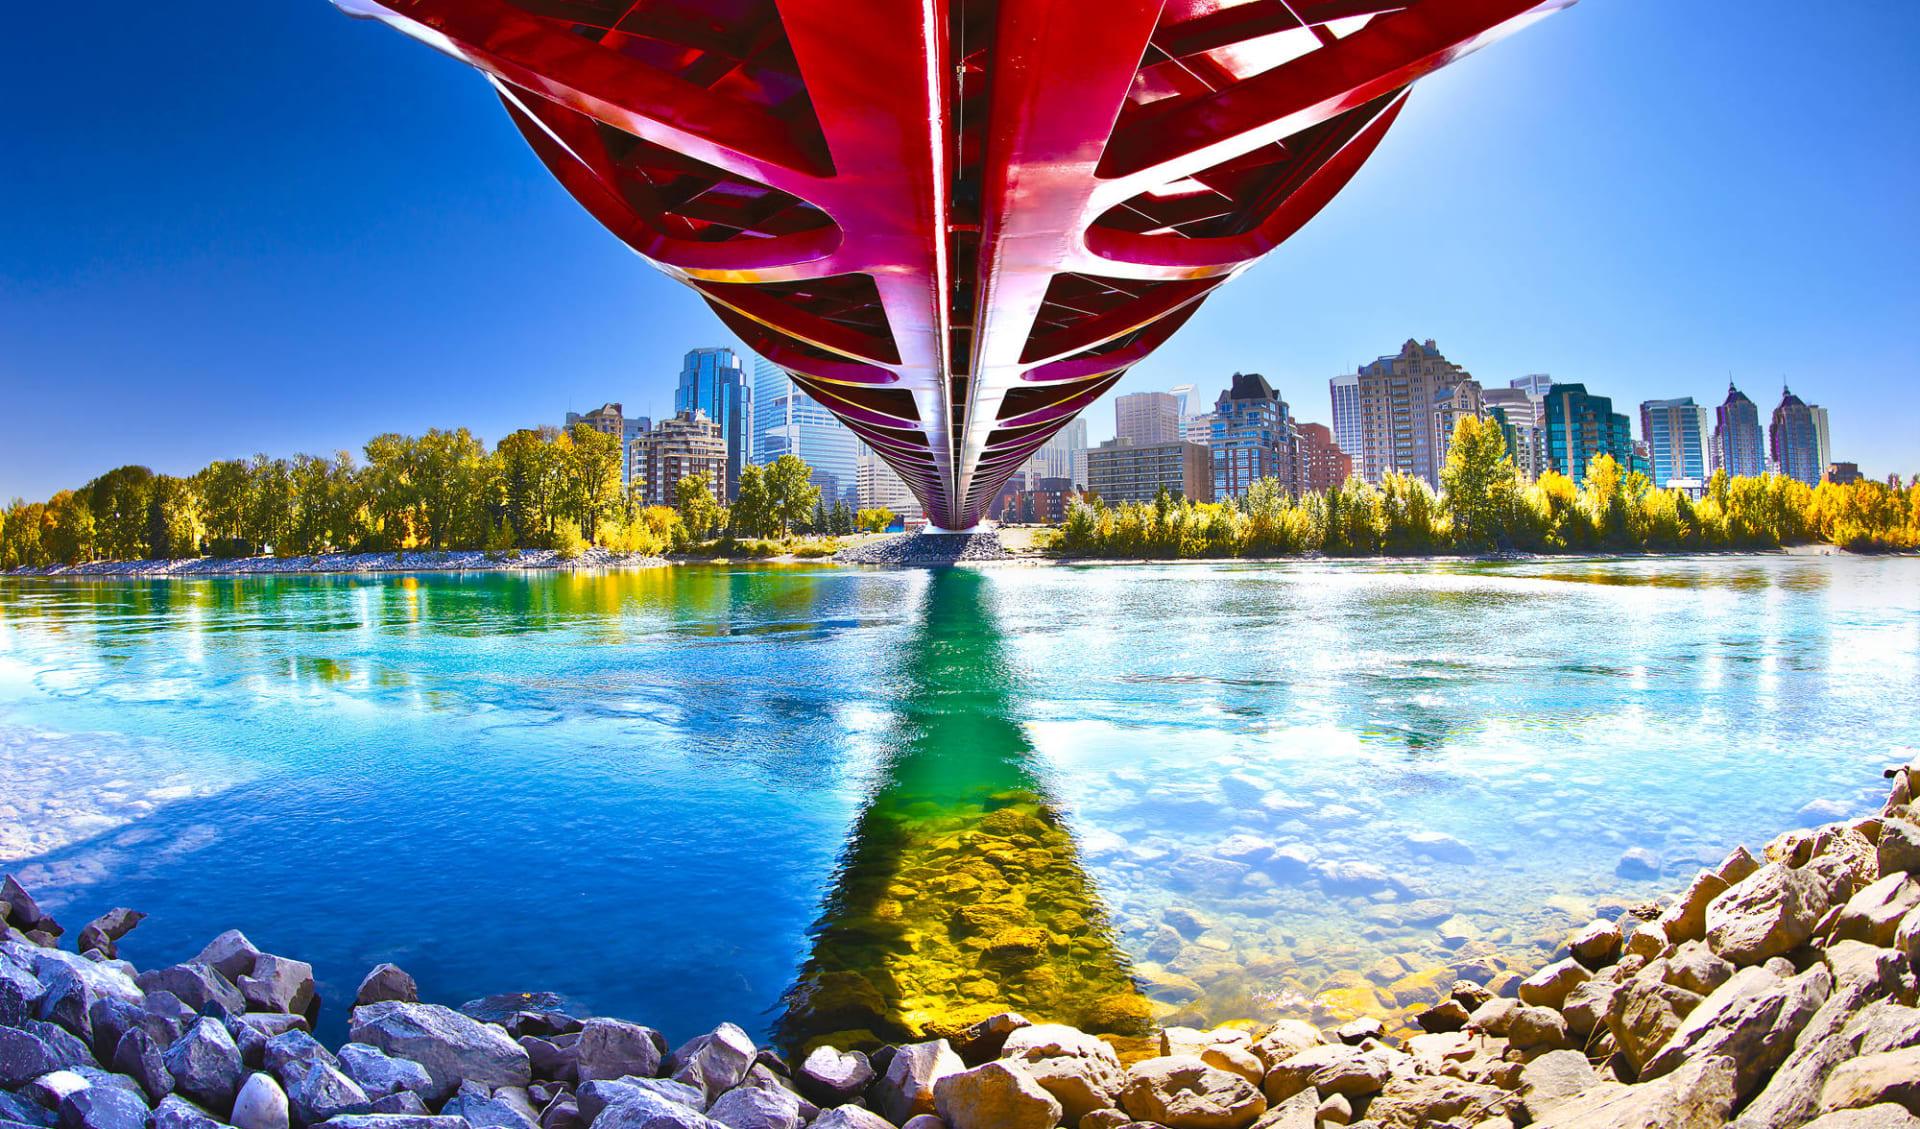 Wandern entlang der Geheimtipps Westkanadas ab Calgary: Kanada - Alberta - Calgary Peace Bridge